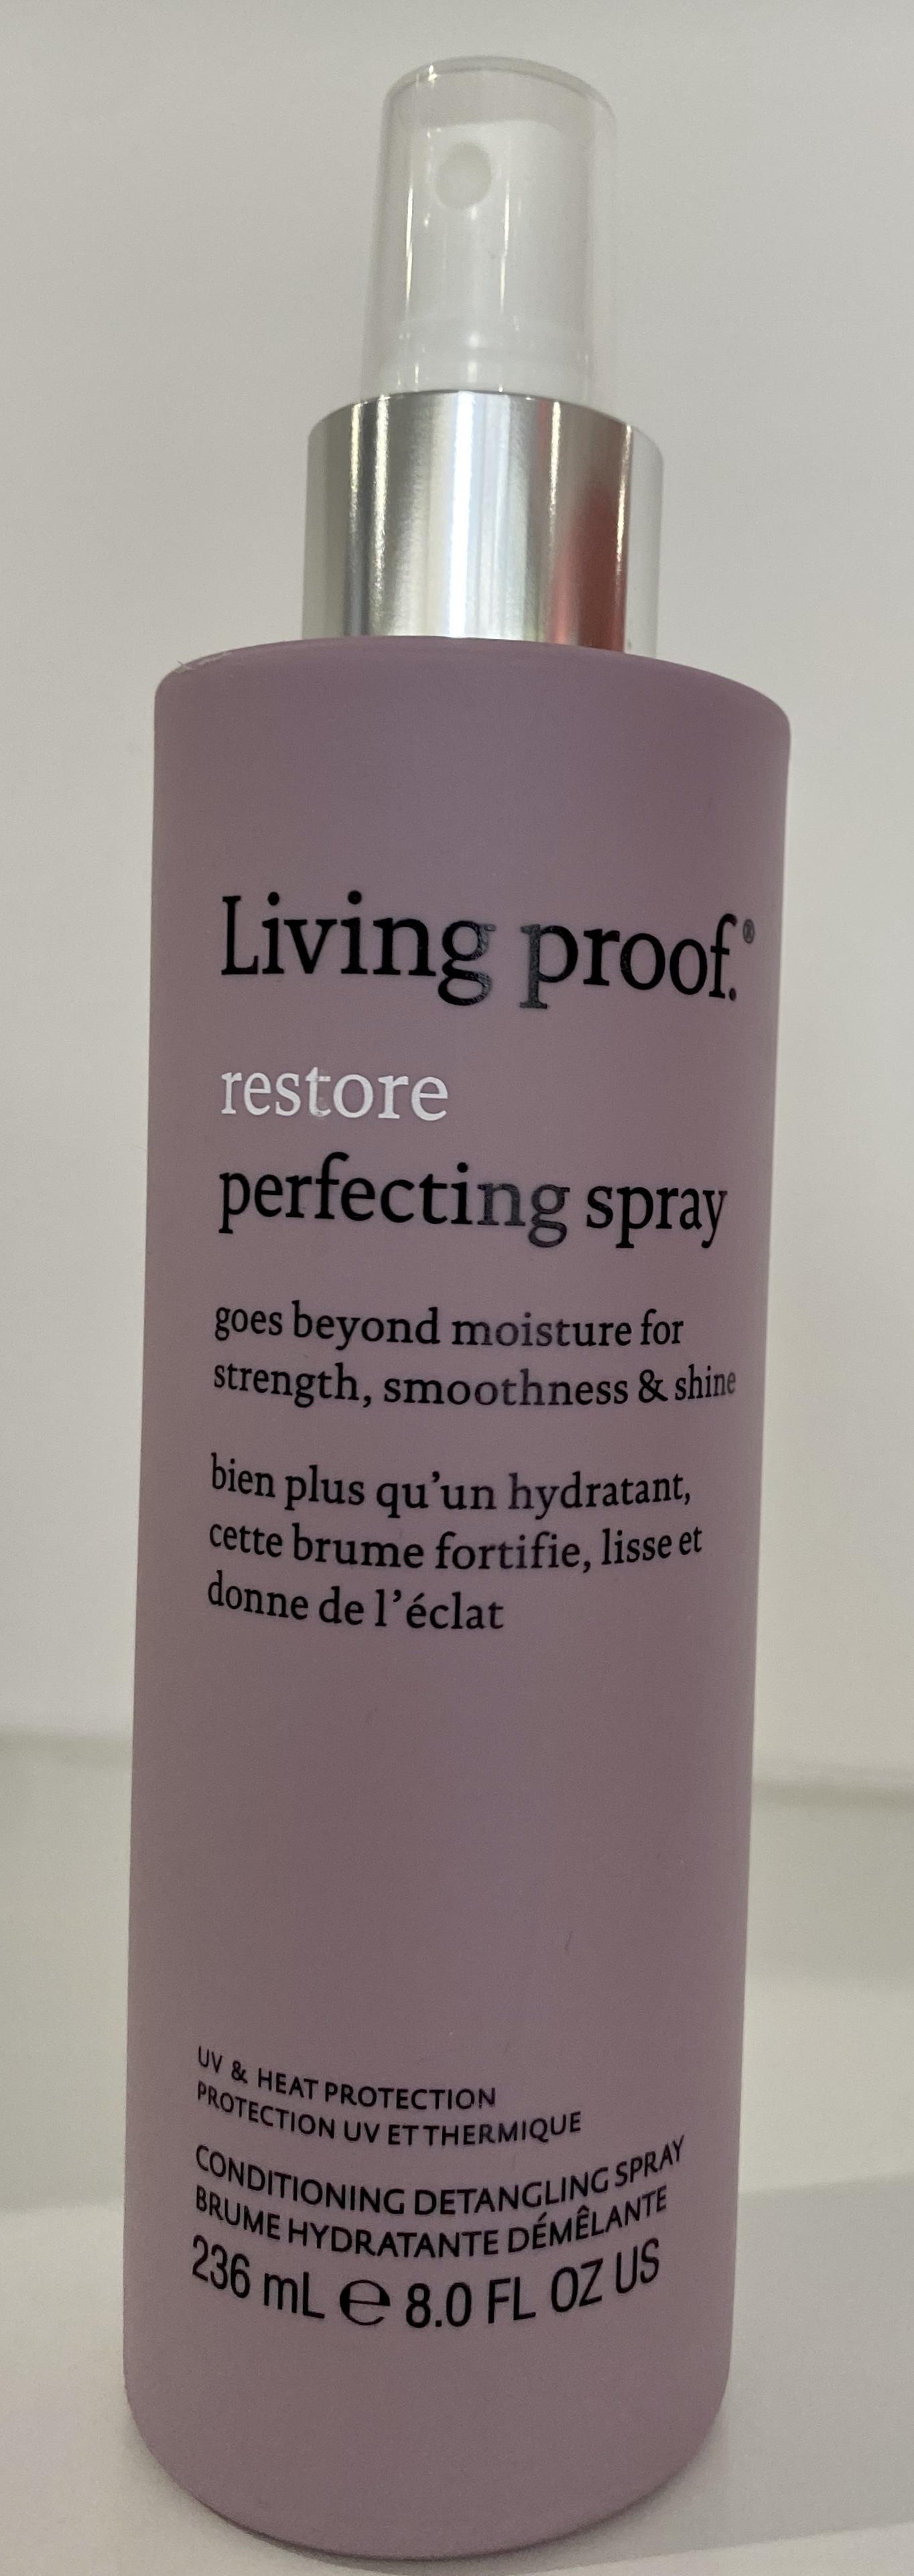 Restore Perfecting Spray